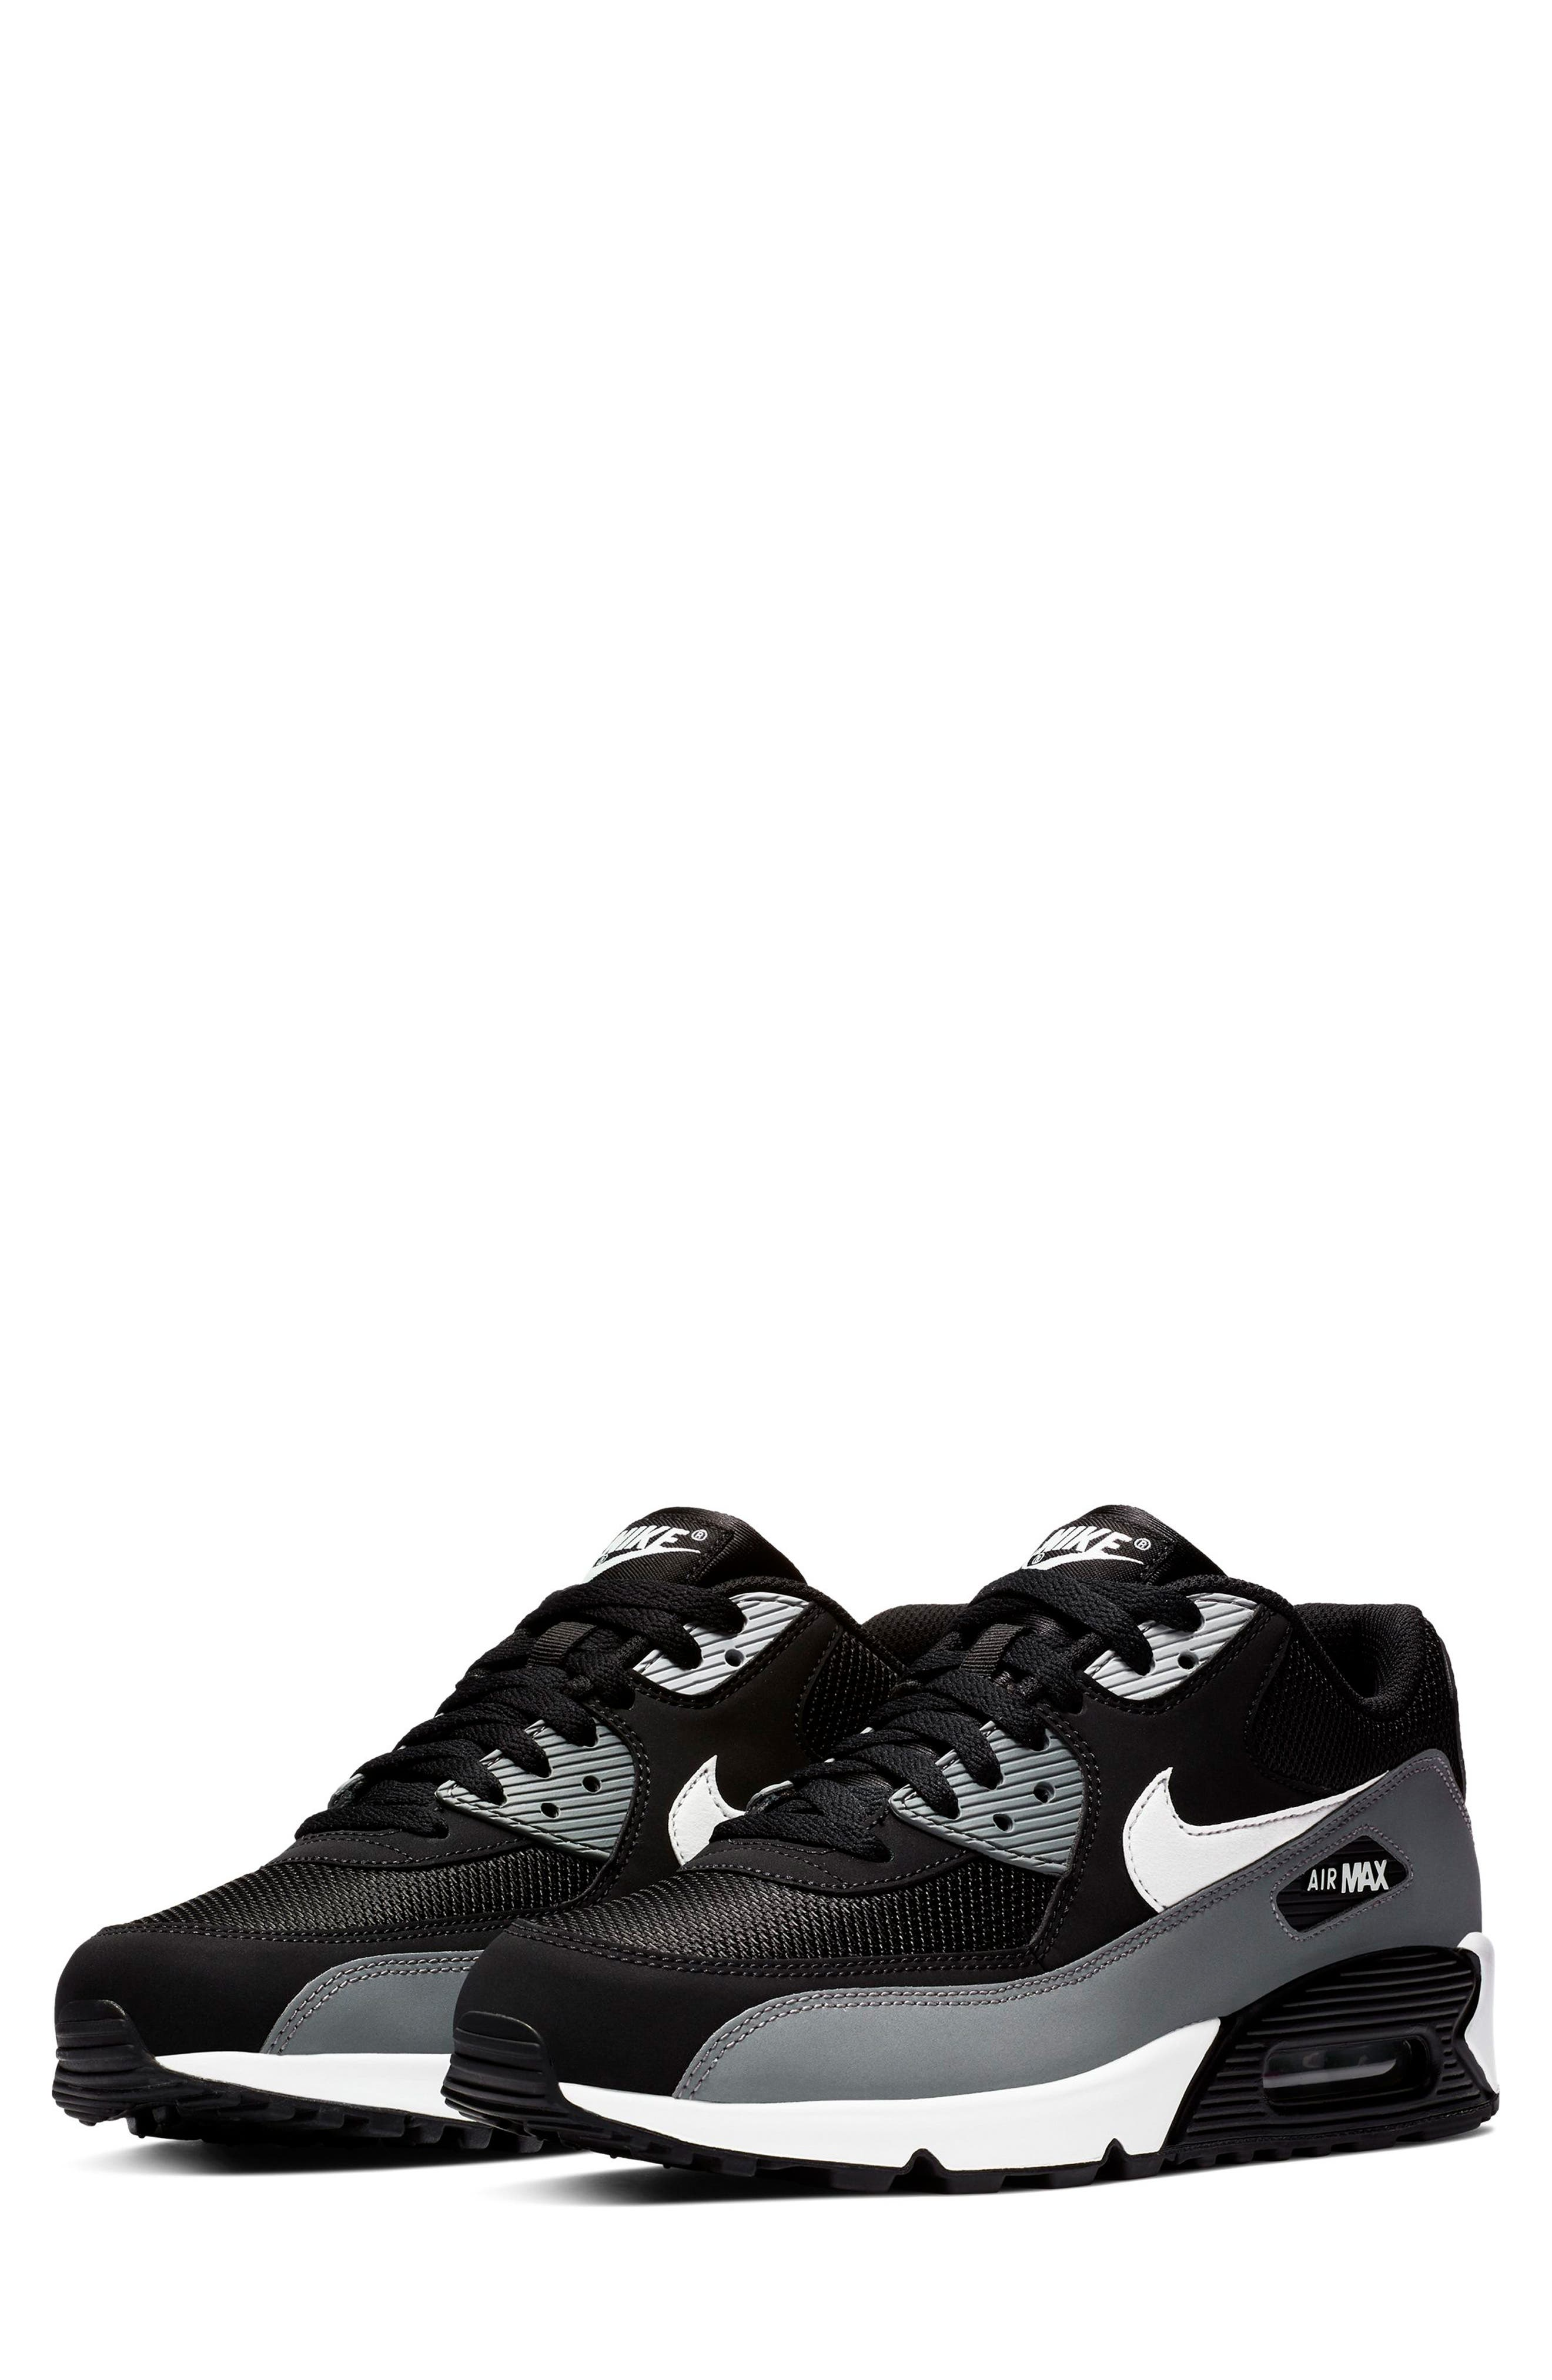 NIKE Air Max 90 Essential Sneaker, Main, color, BLACK/ WHITE/ COOL GREY